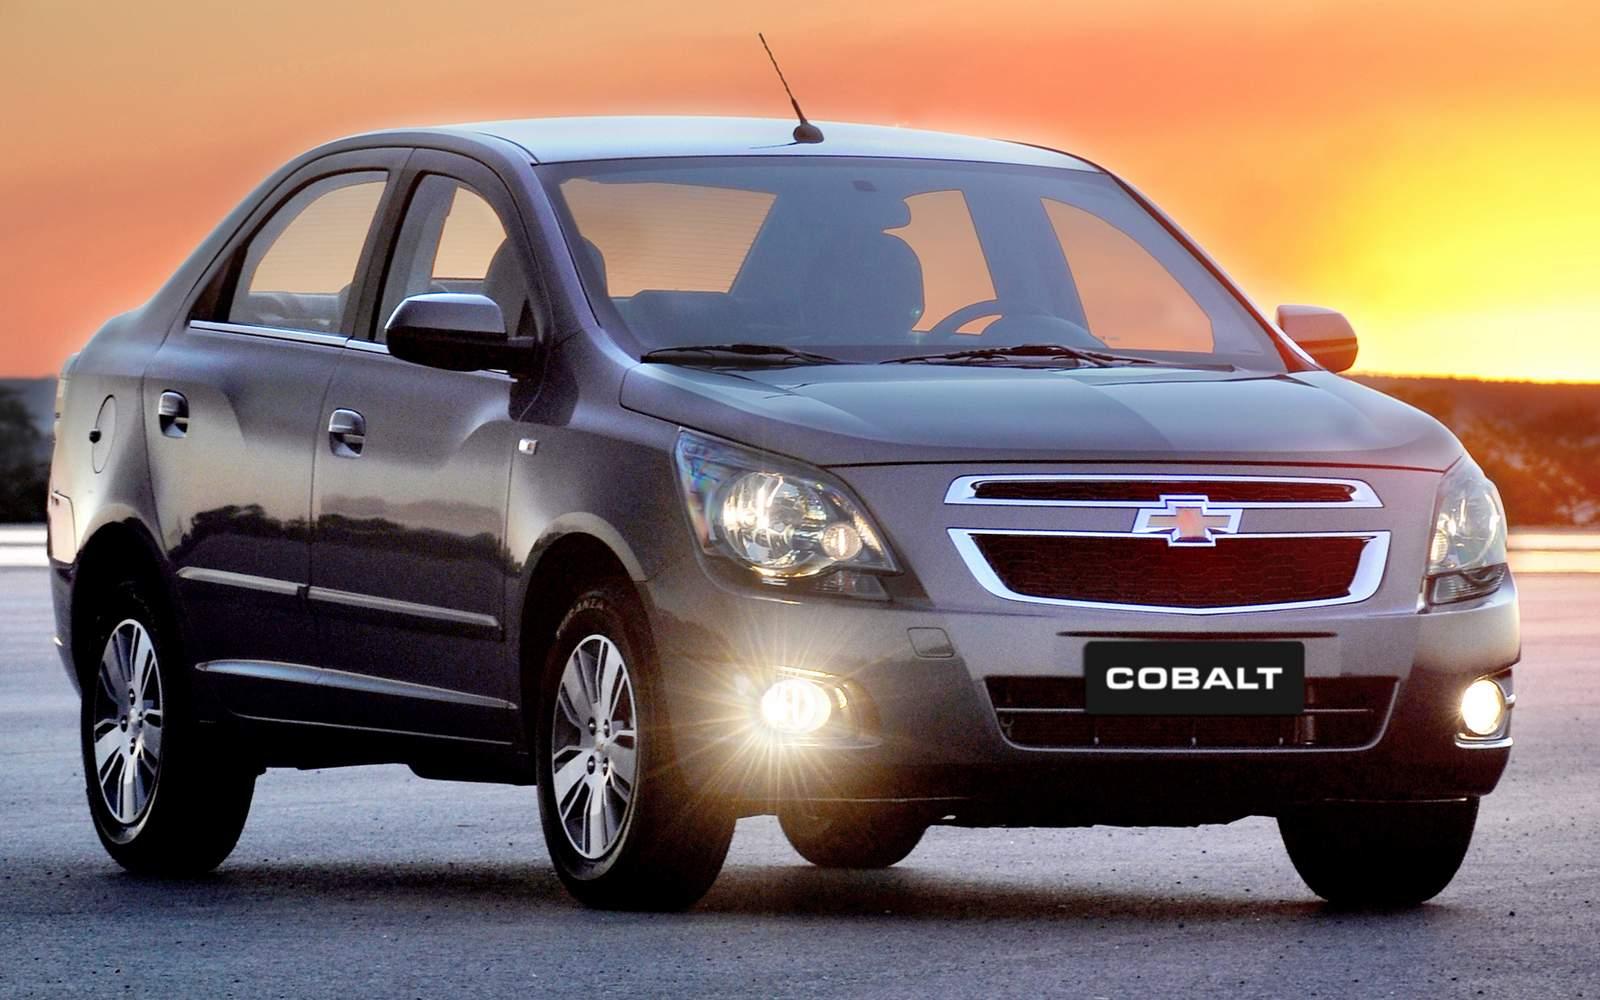 Chevrolet Cobalt - Exterior plata de tu auto familiar